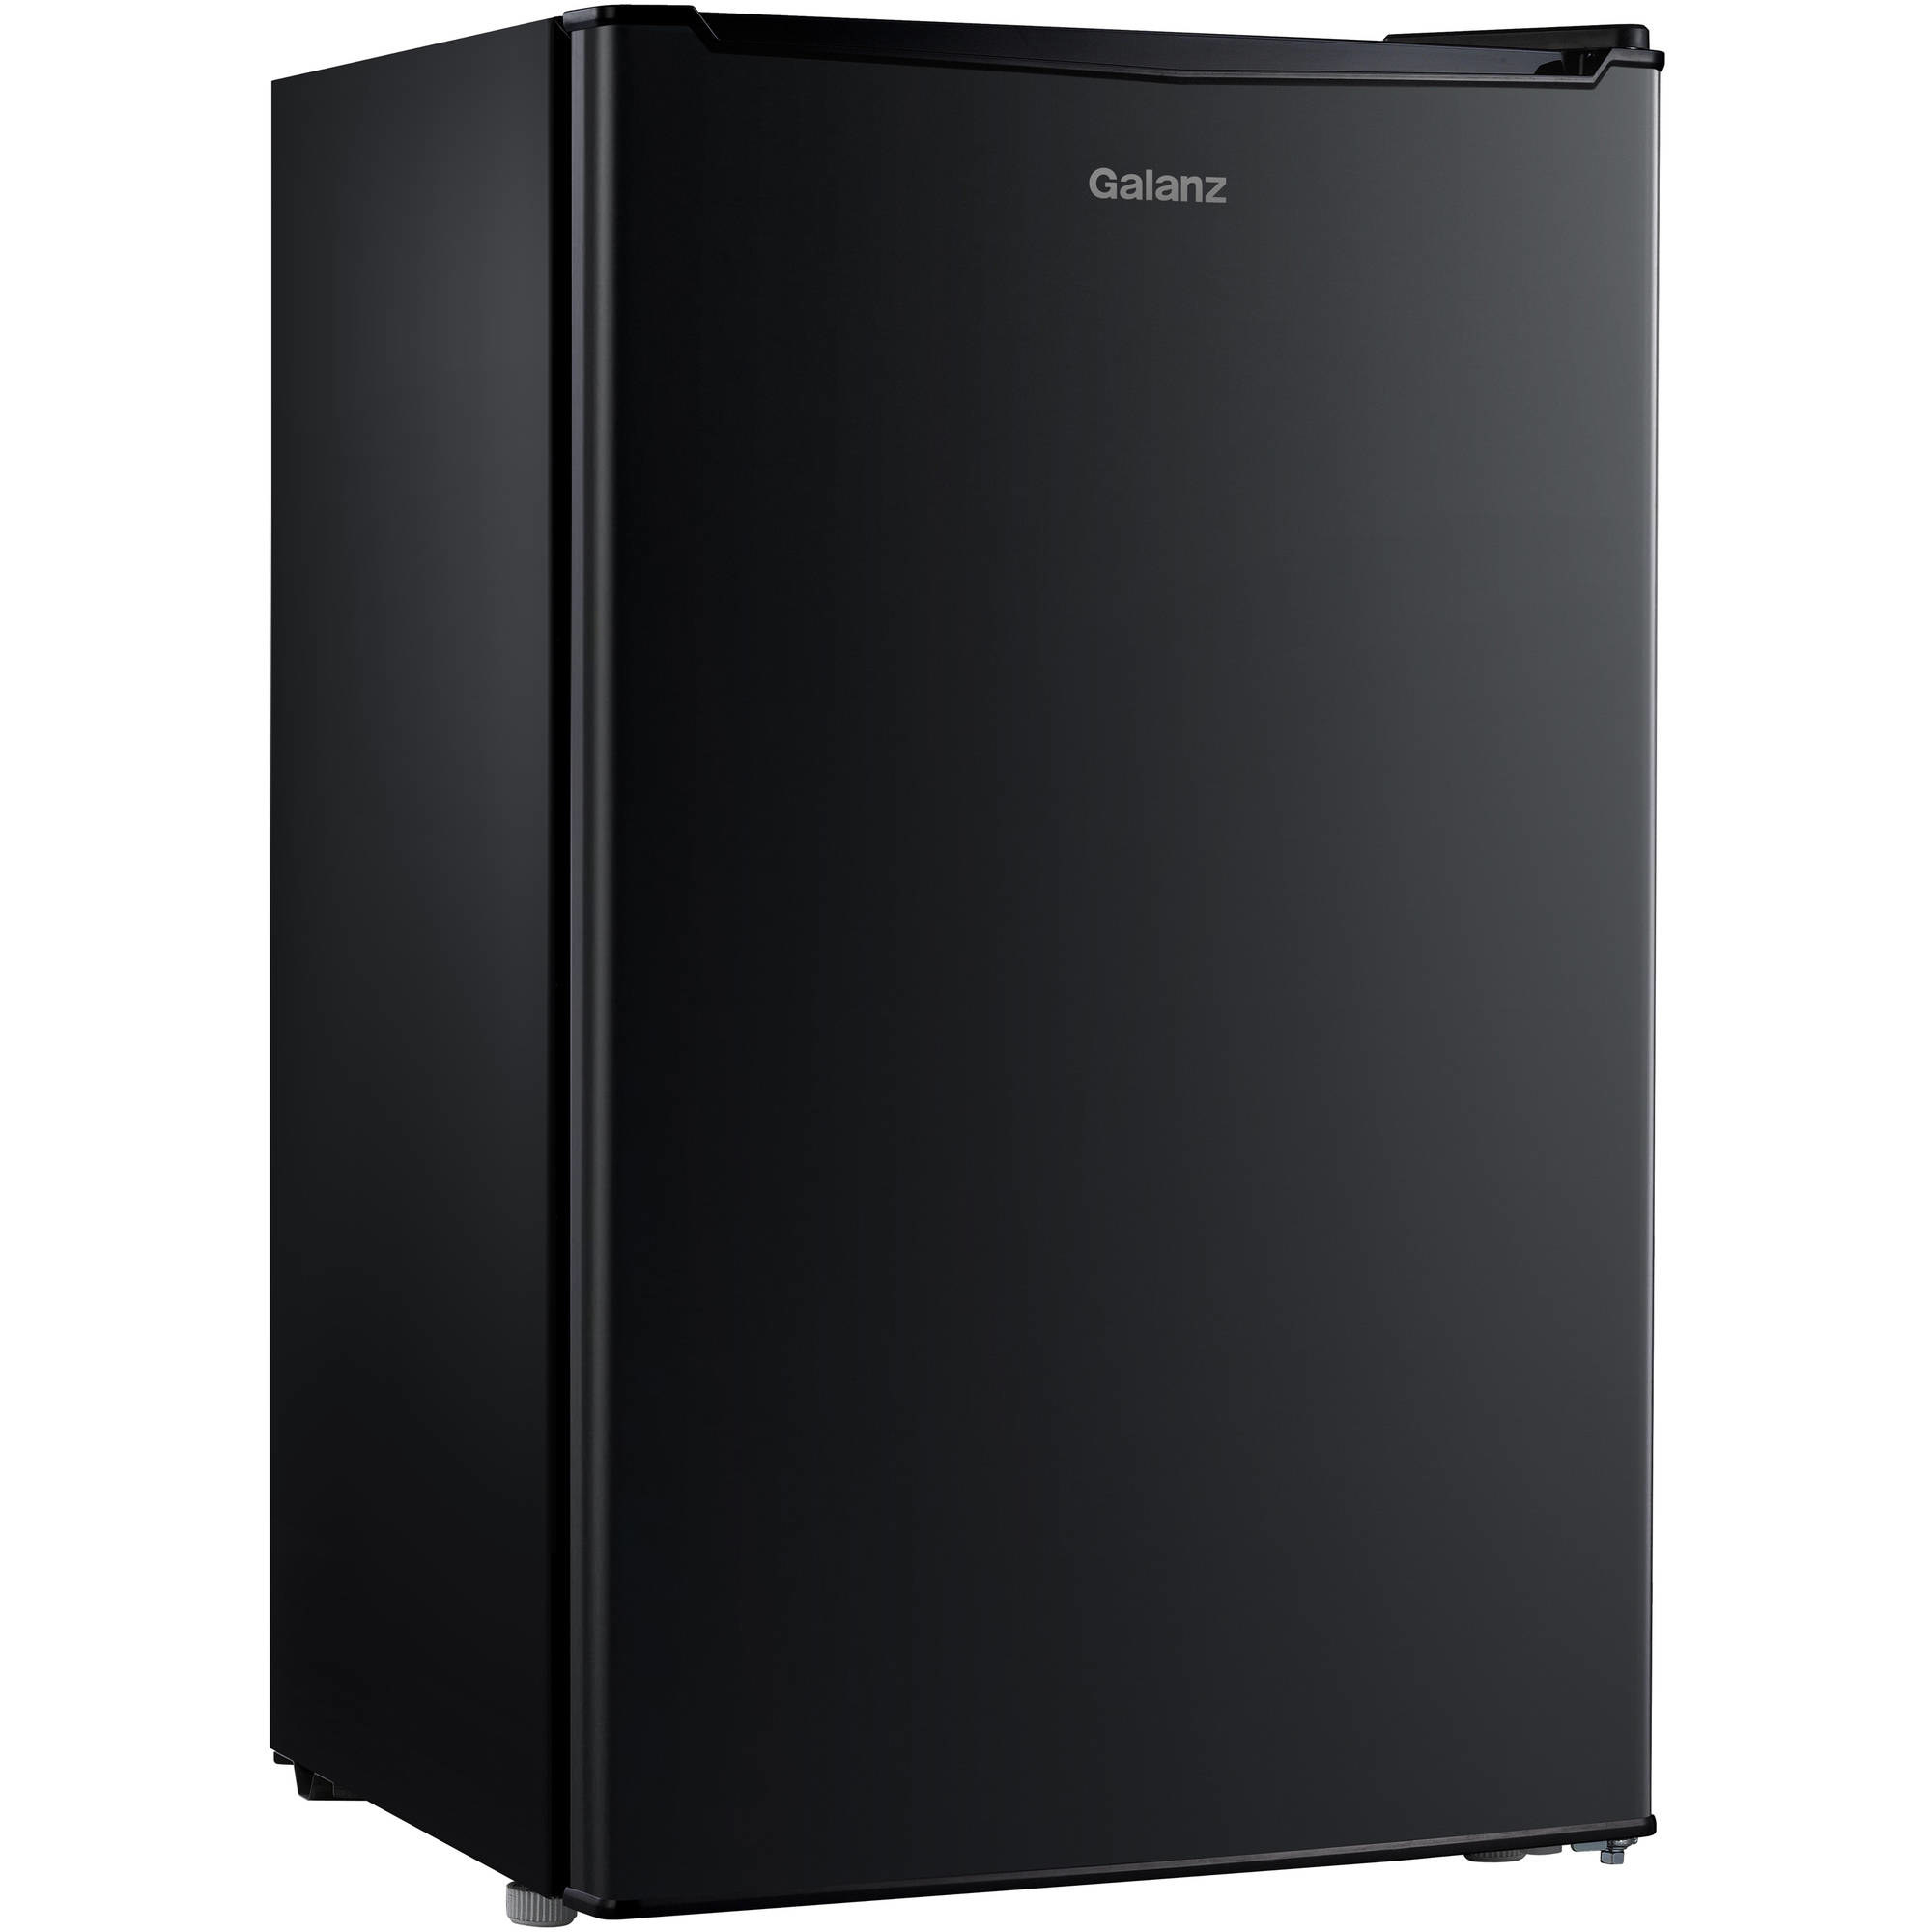 the black fridge